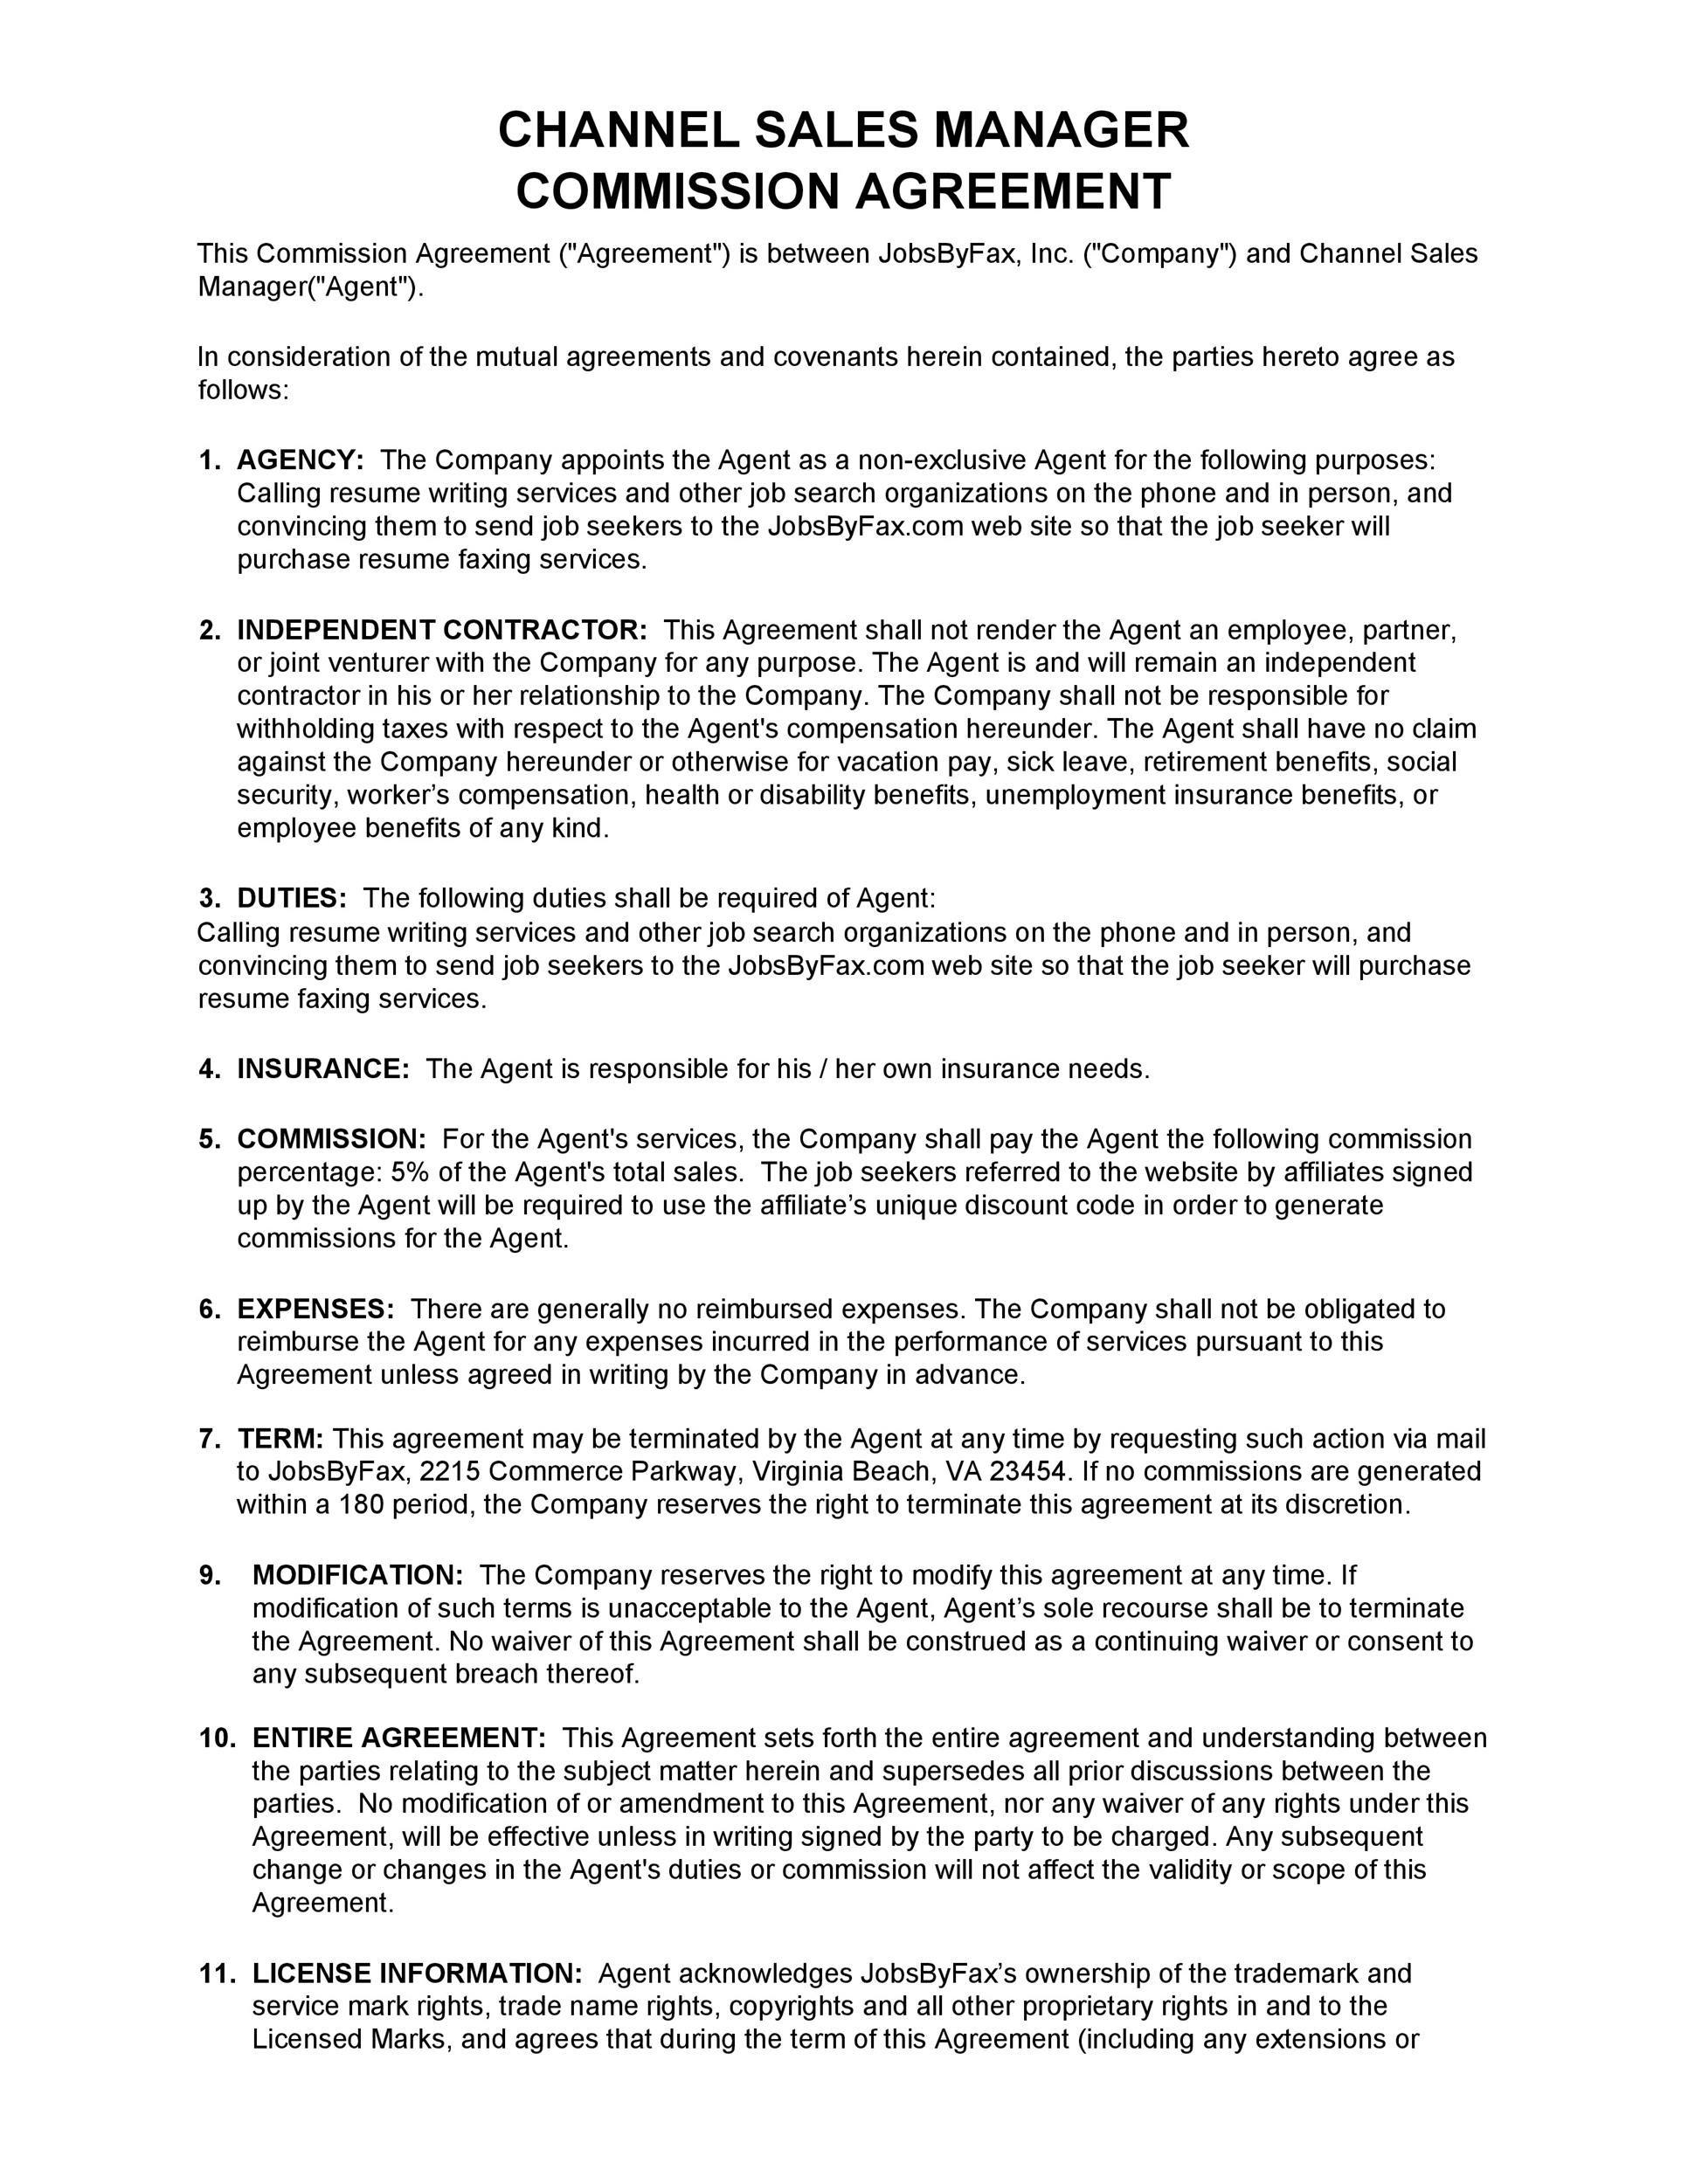 007 Unusual Sale Agreement Template Australia Picture  Busines Horse Car ContractFull